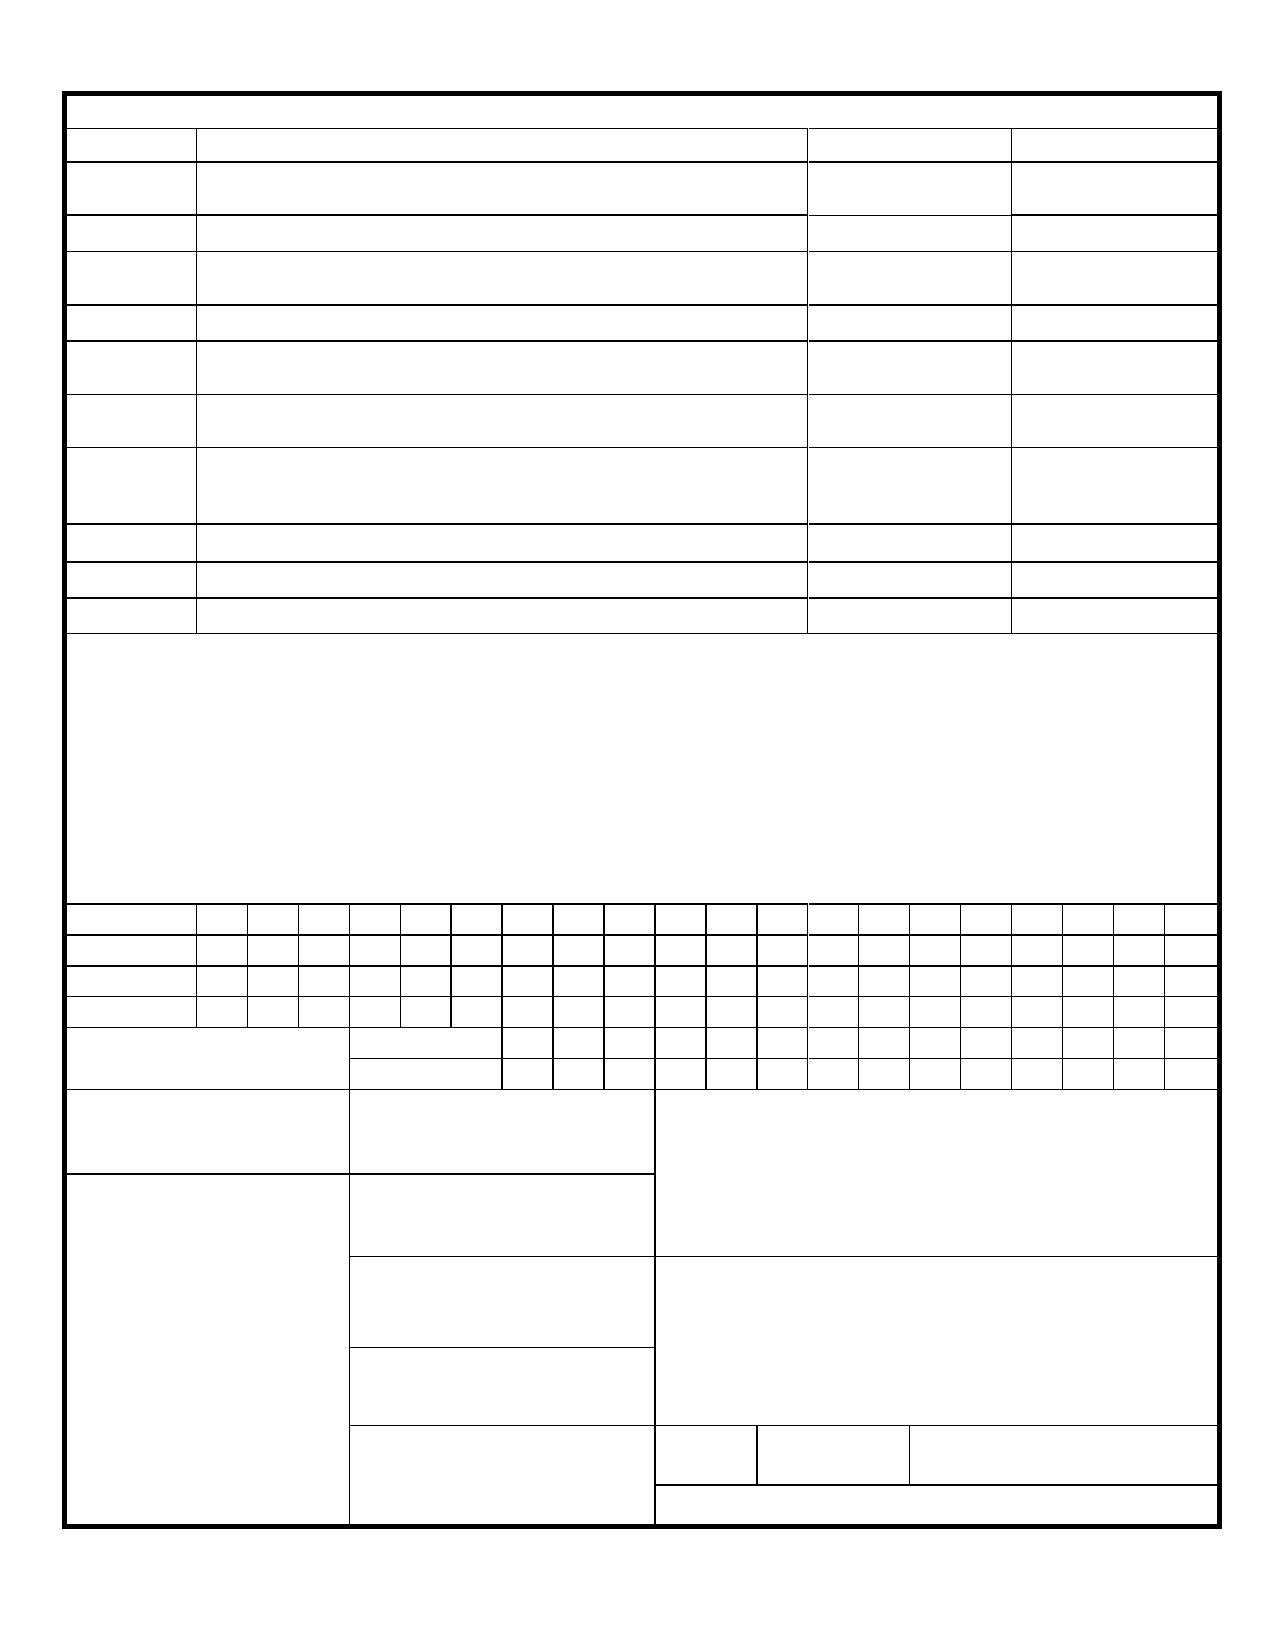 78004xx دیتاشیت PDF